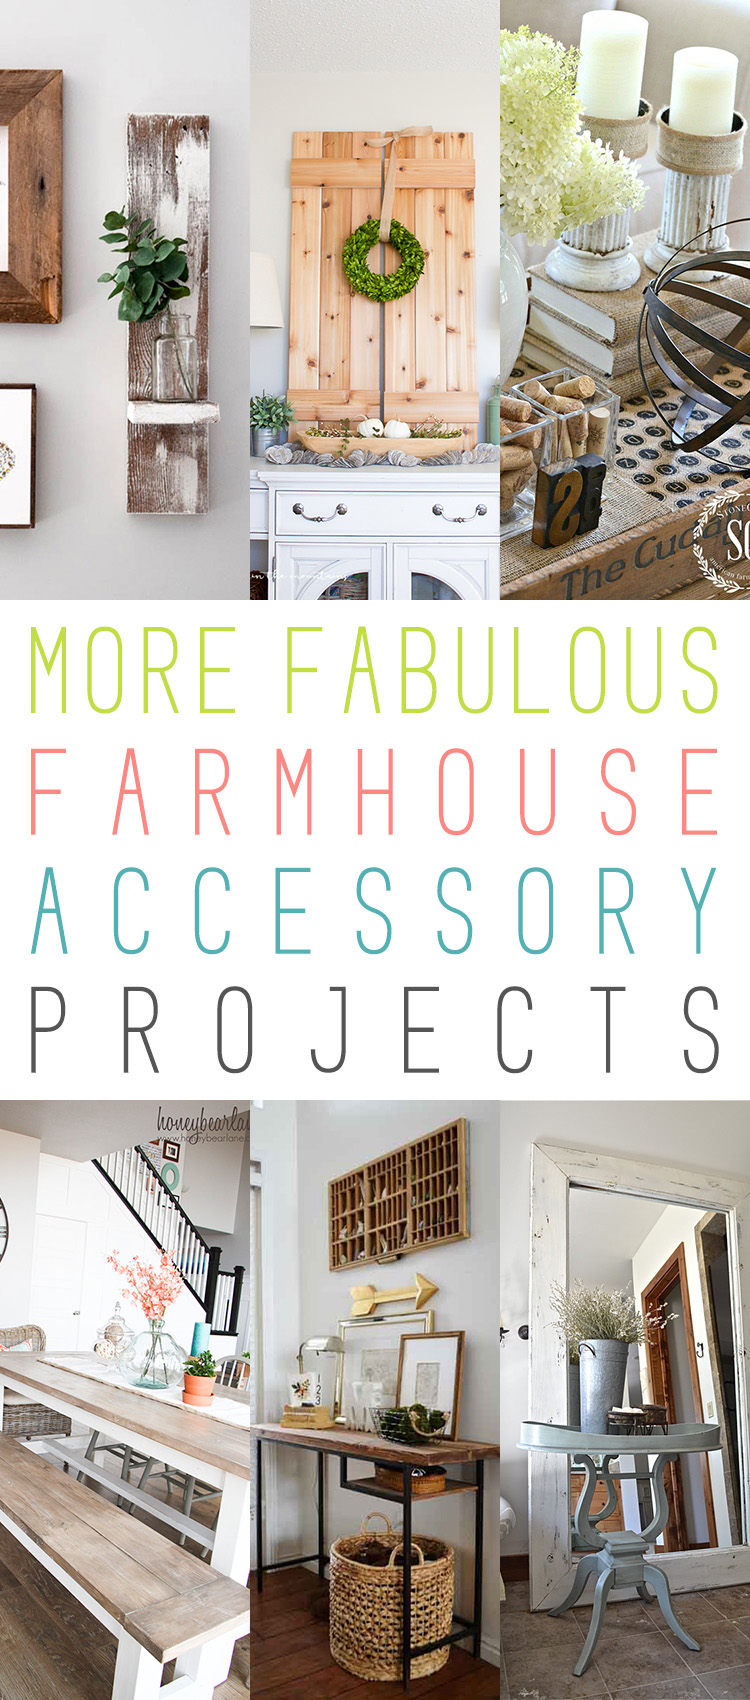 Farmhouse-TOWER-00001